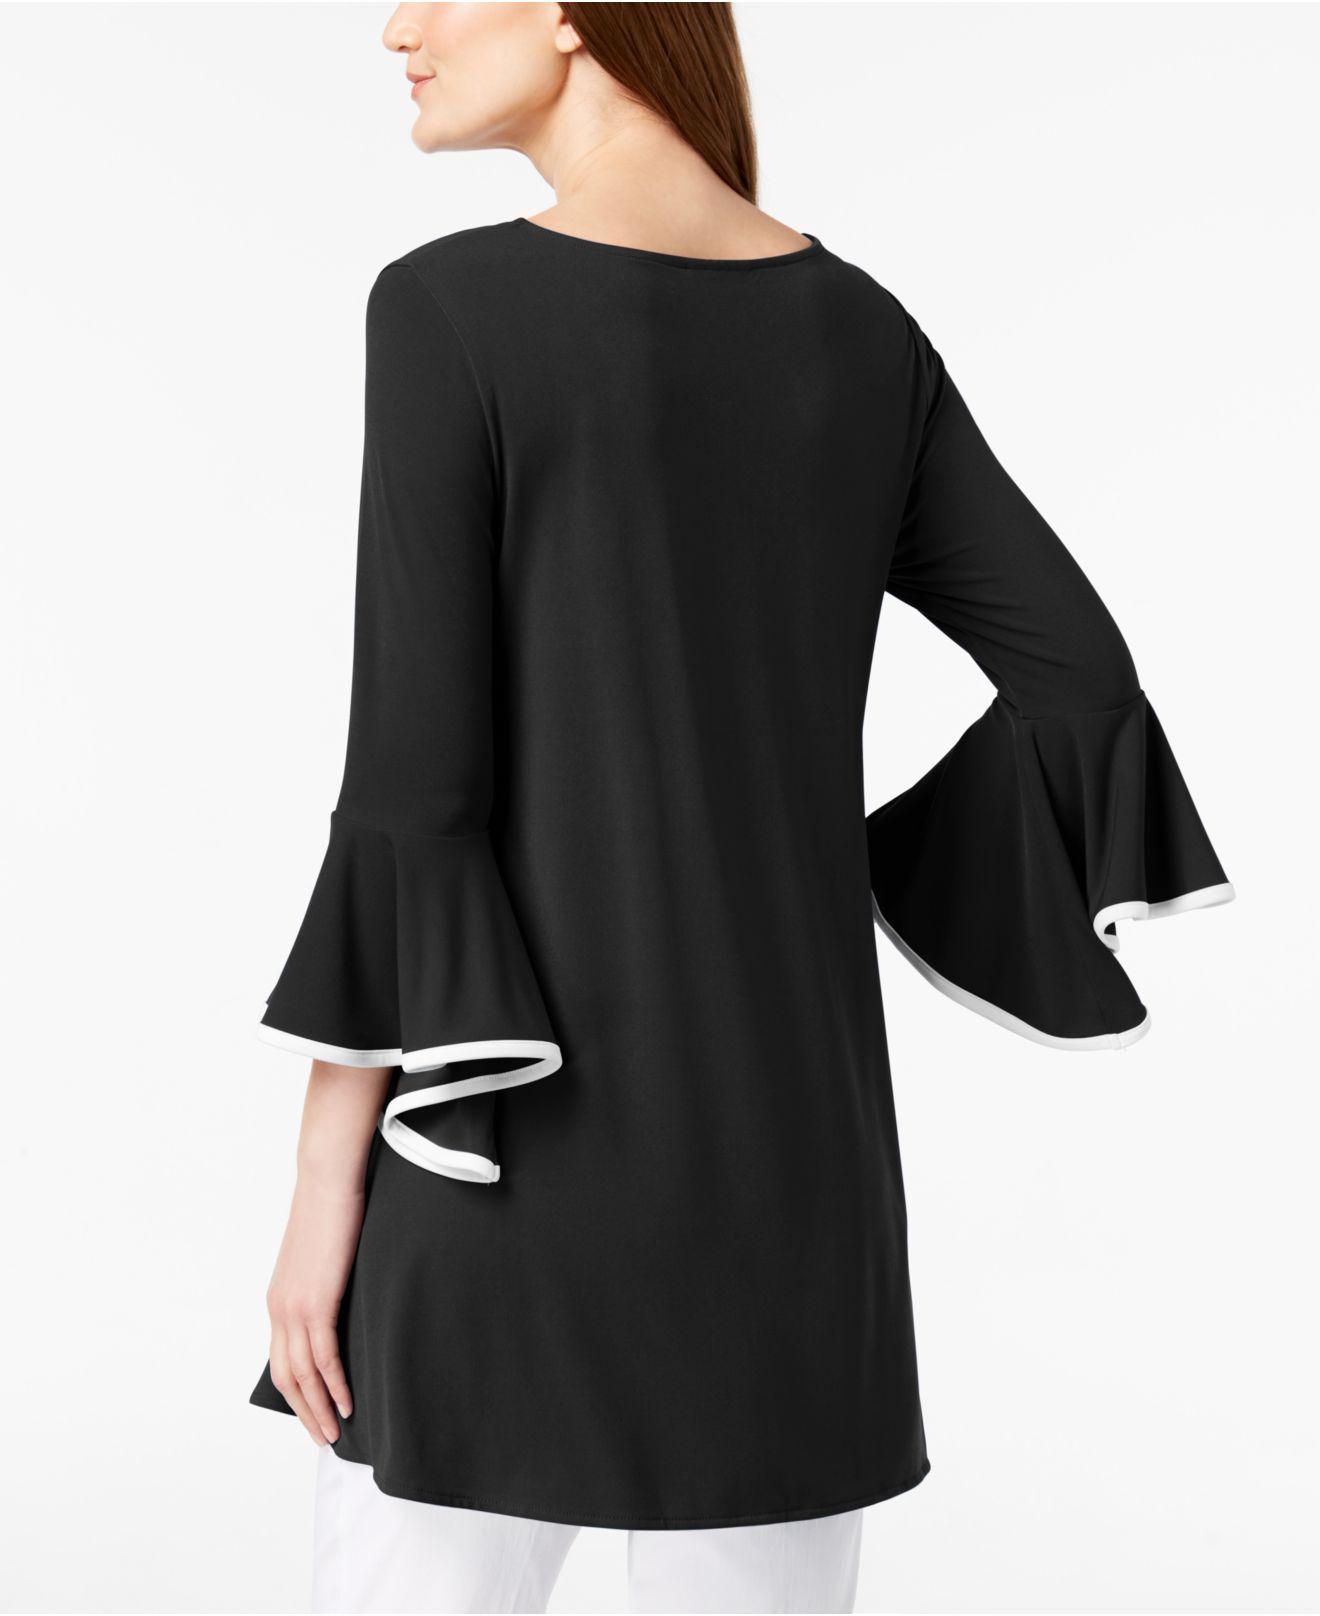 e3b803aabf6189 Lyst - Alfani Bell-sleeve Handkerchief-hem Top